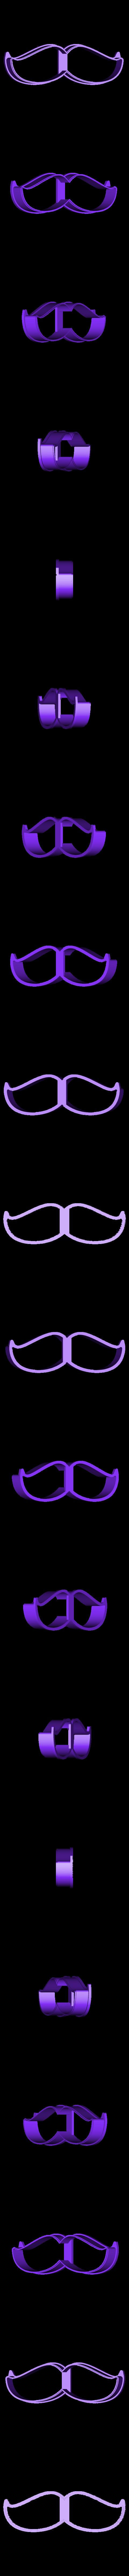 00803 usi N2.stl Download OBJ file Mustache 2 cookie cutter for professional • 3D printer model, gleblubin